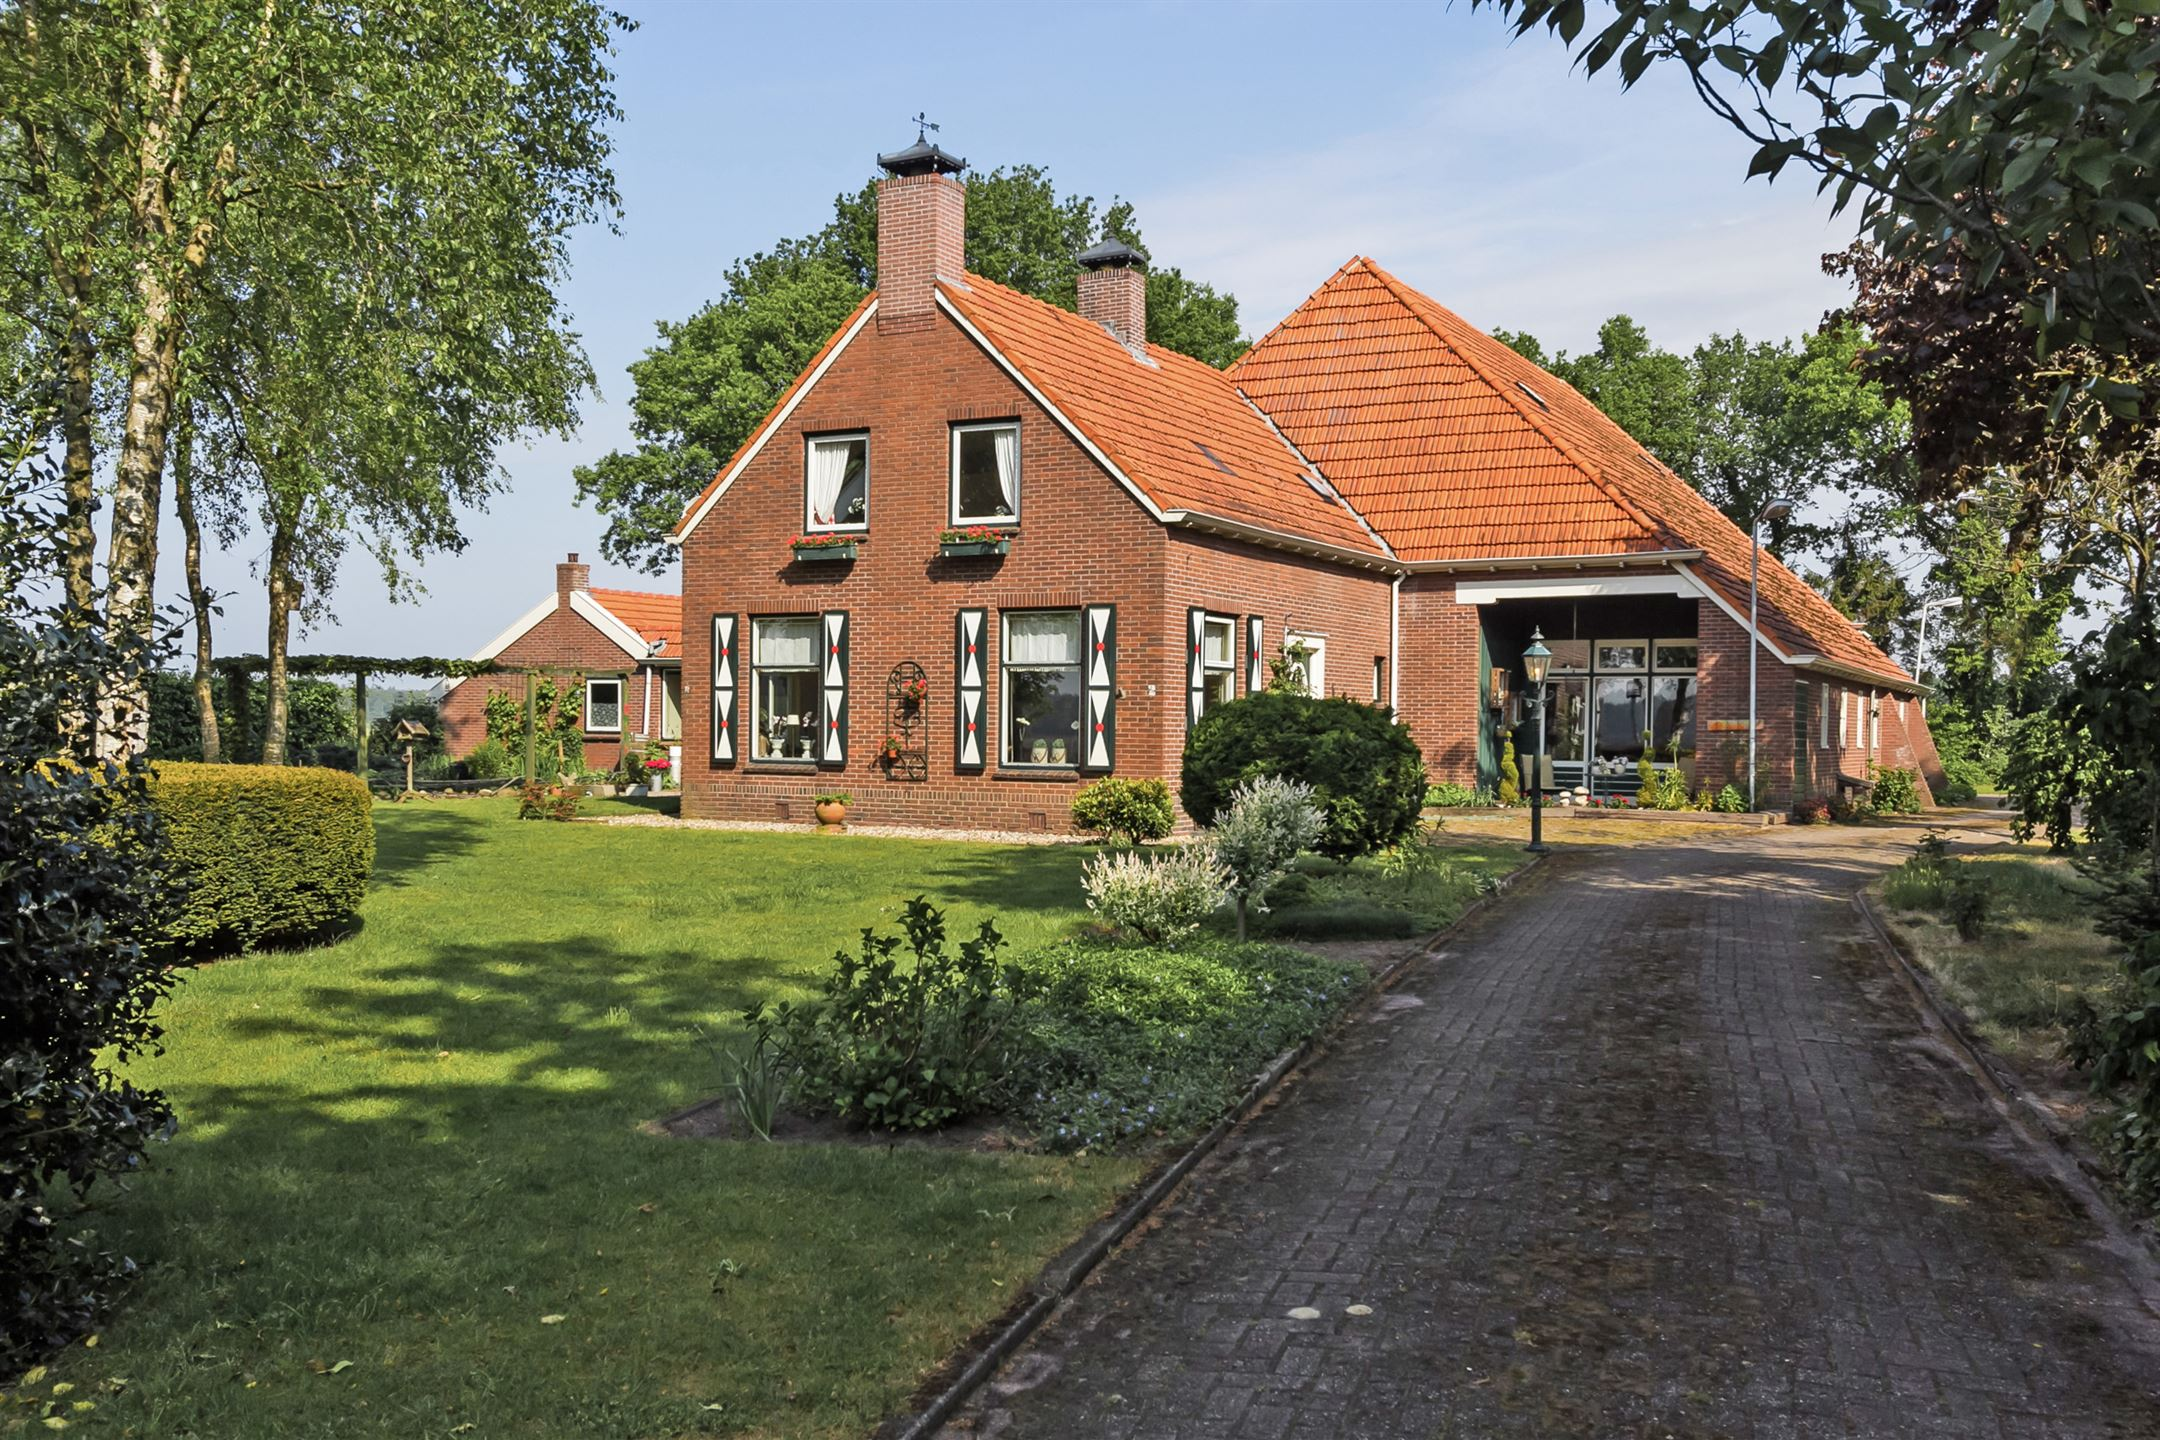 Huis te koop zevenmeersveenweg 2 9551 vv sellingen funda - Huis vv ...